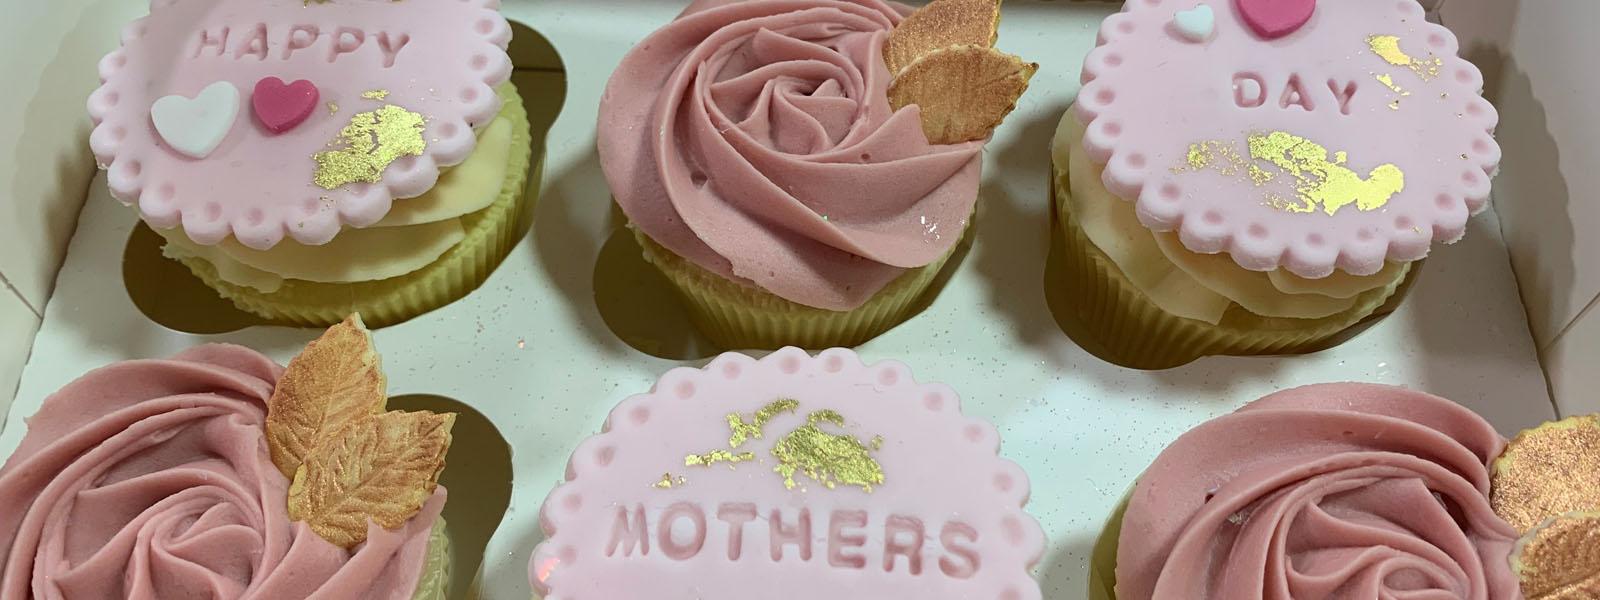 Happy Mothers Day from HoneyBee Bakery